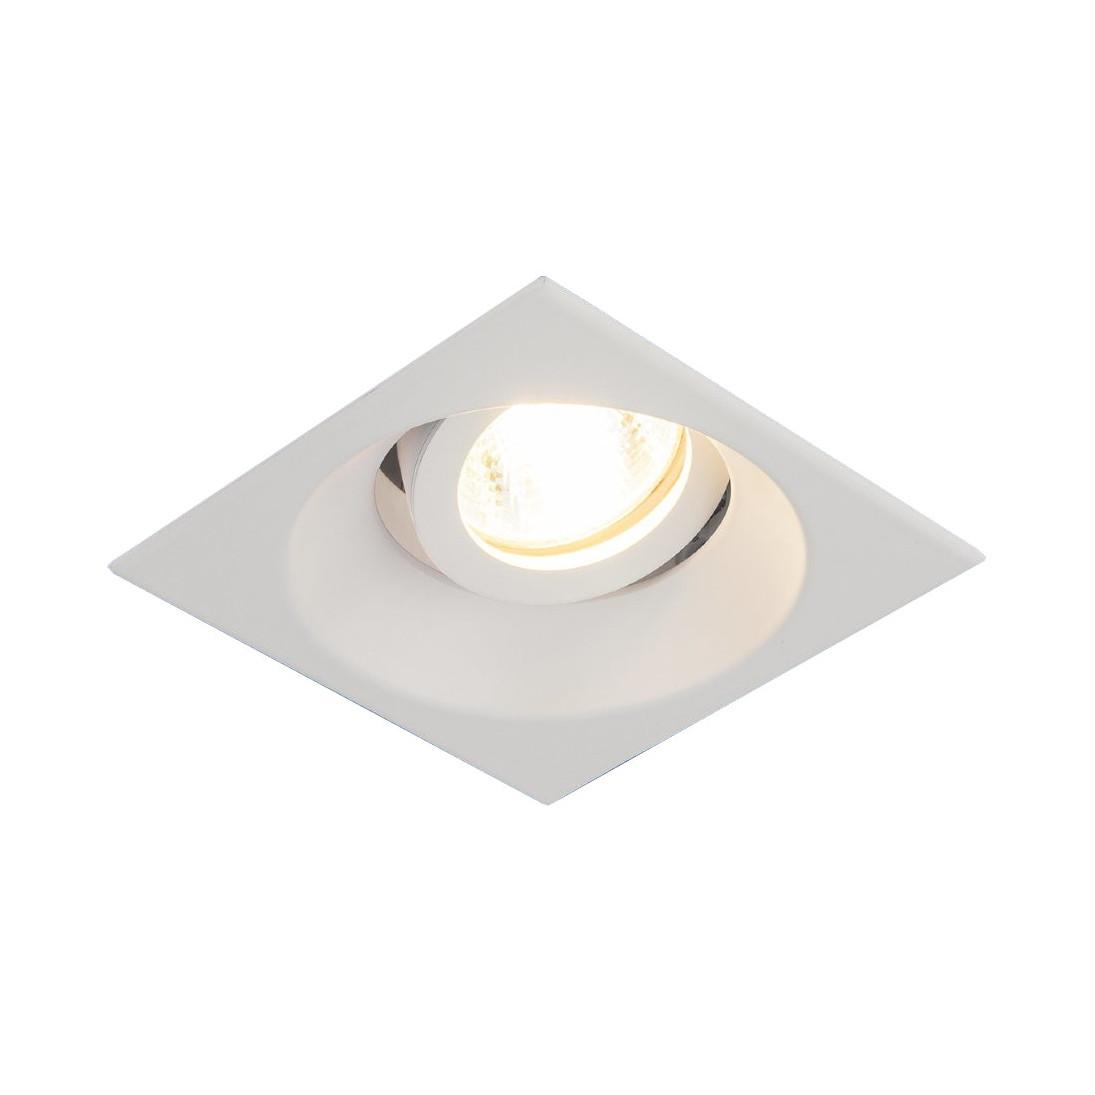 Elektrostandard 6069 WH (MR16) белый Светильник